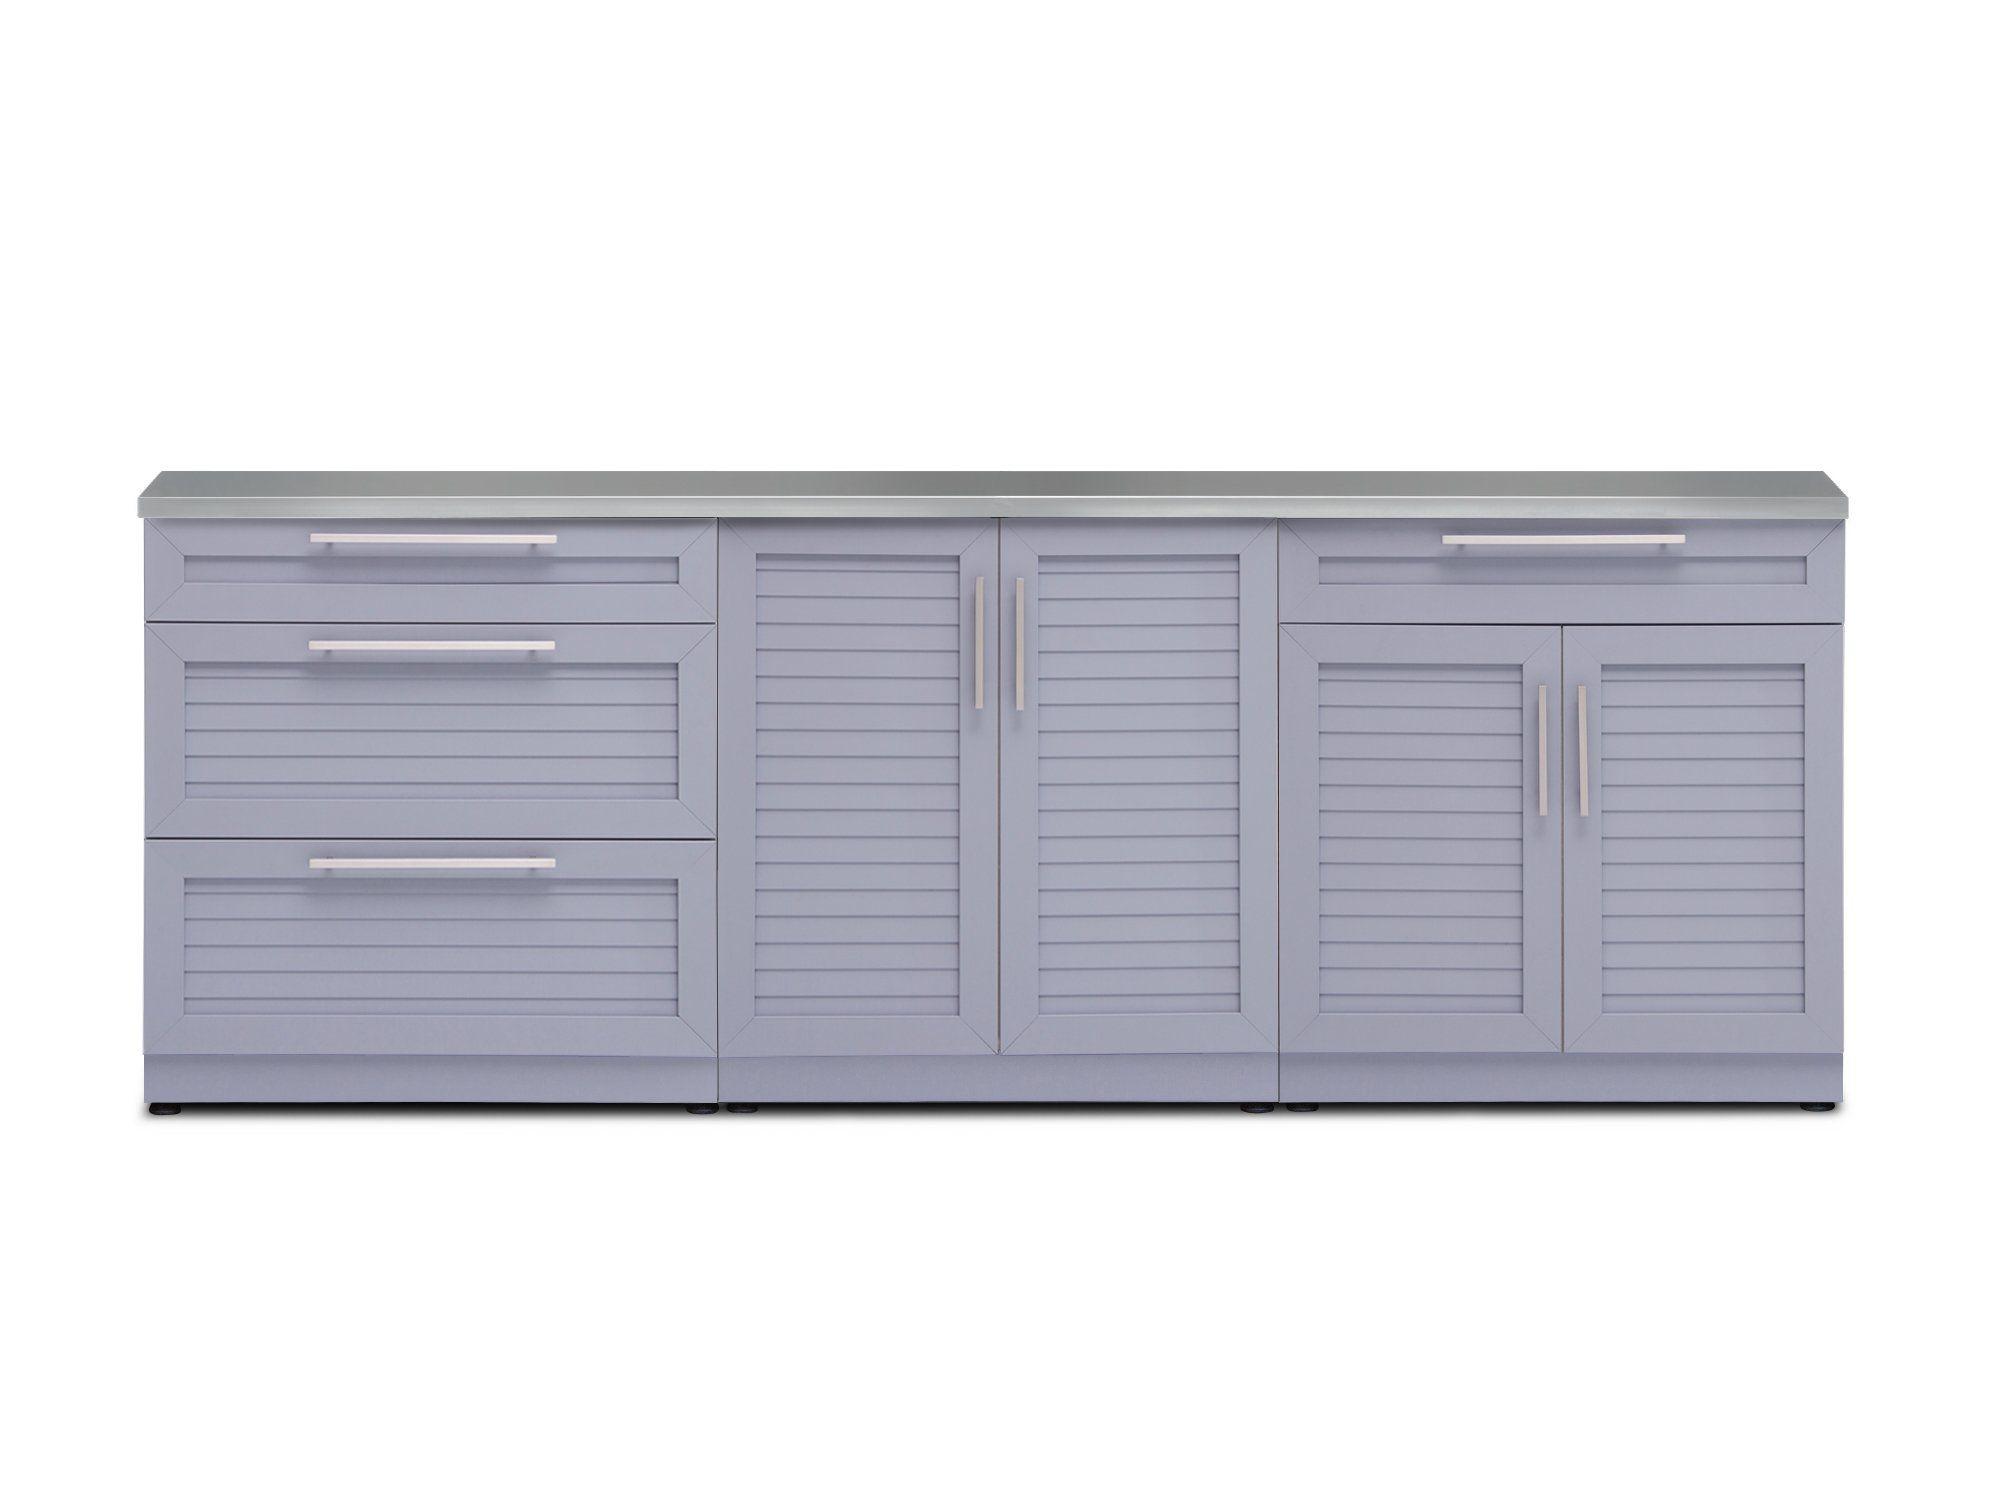 Aluminum Outdoor Kitchen Cabinets Kits Newage Products Us Outdoor Kitchen Cabinets Aluminum Kitchen Cabinets Outdoor Storage Cabinet